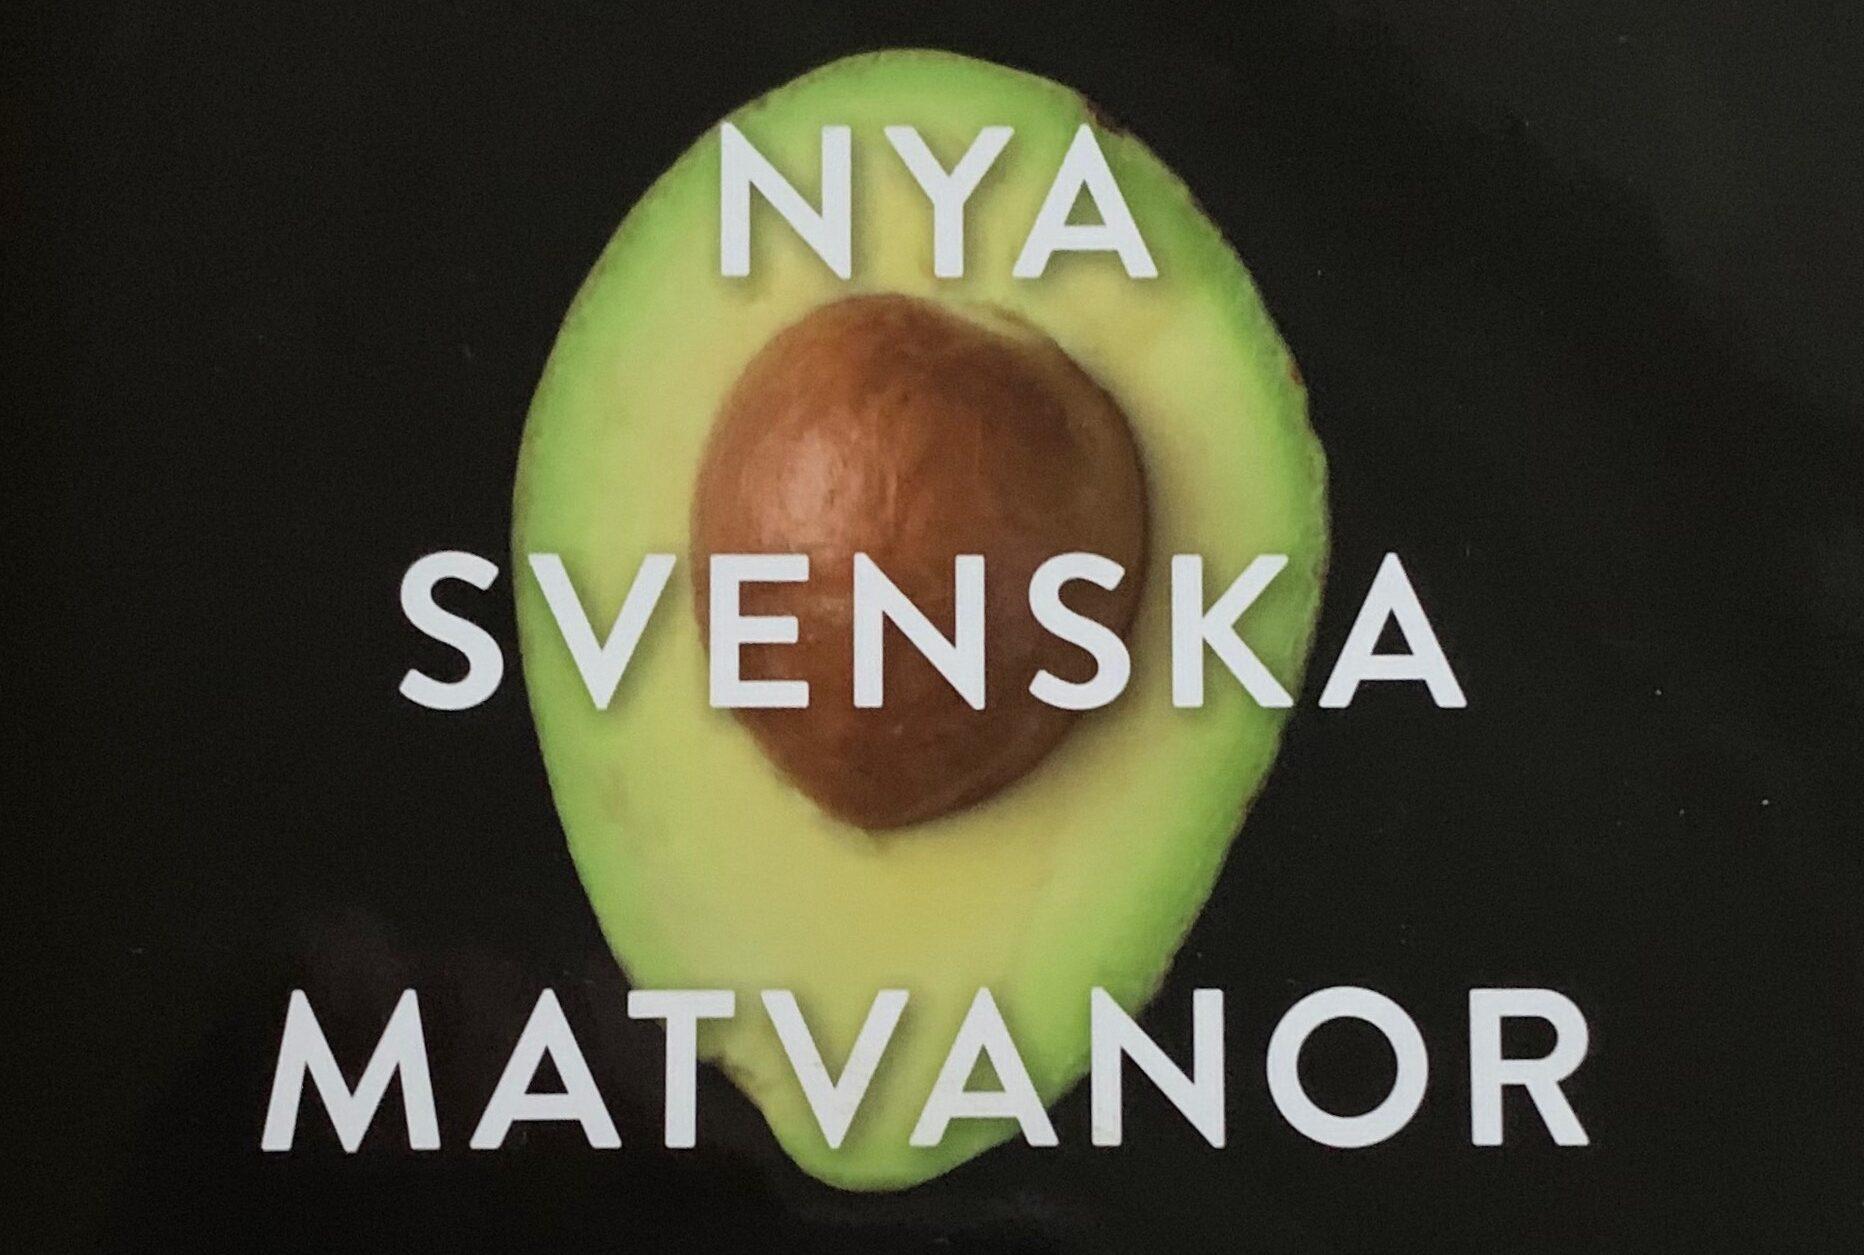 Nya Svenska Matvaror